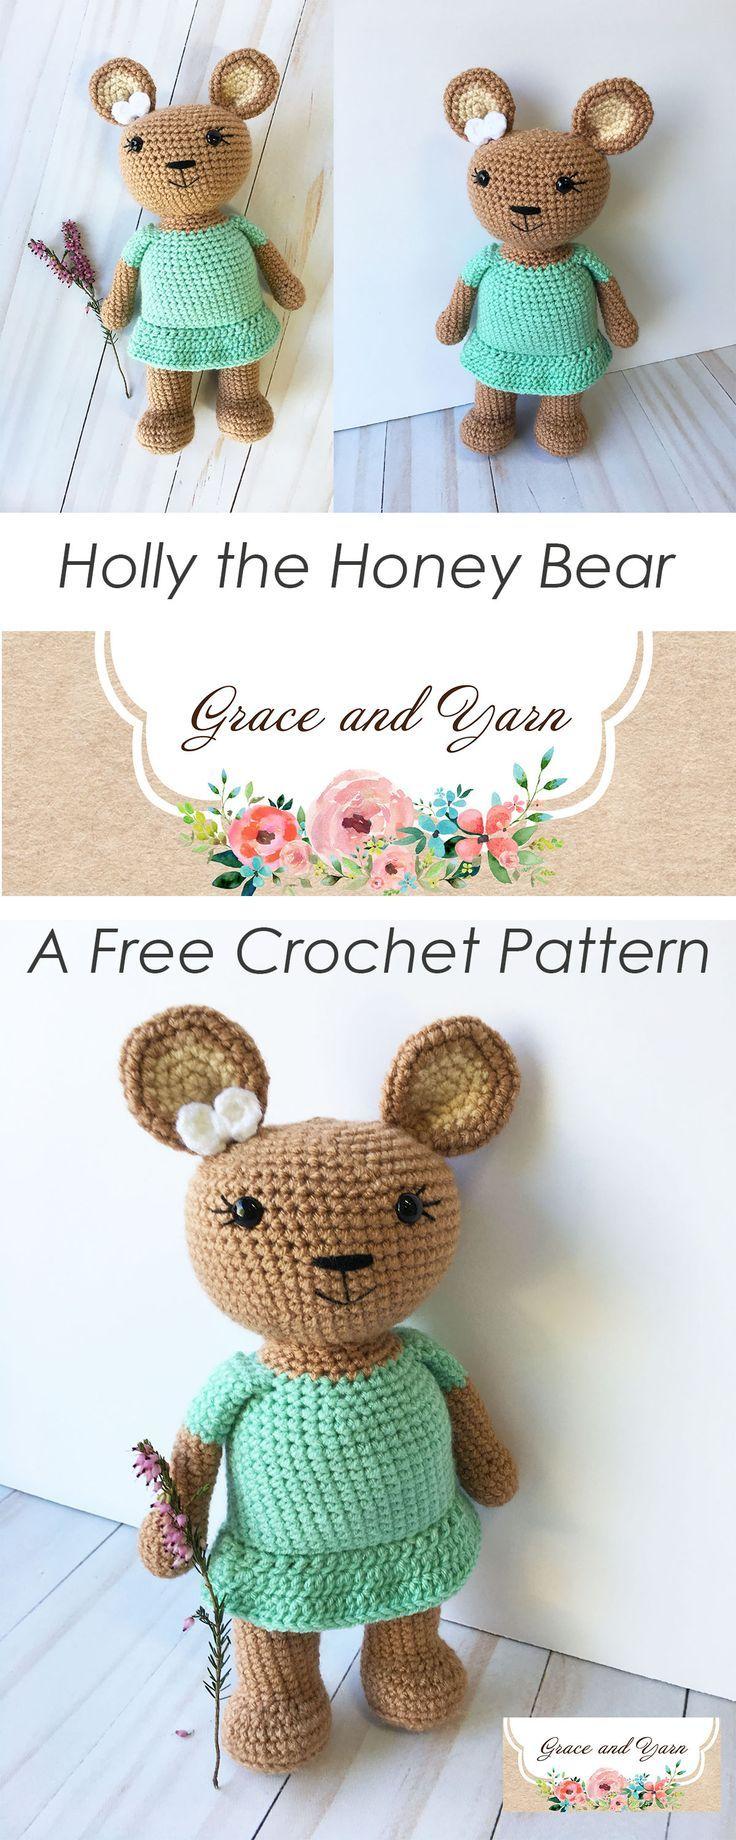 Holly the Honey Bear- A Free Crochet Pattern | CRAFTS - Crochet ...